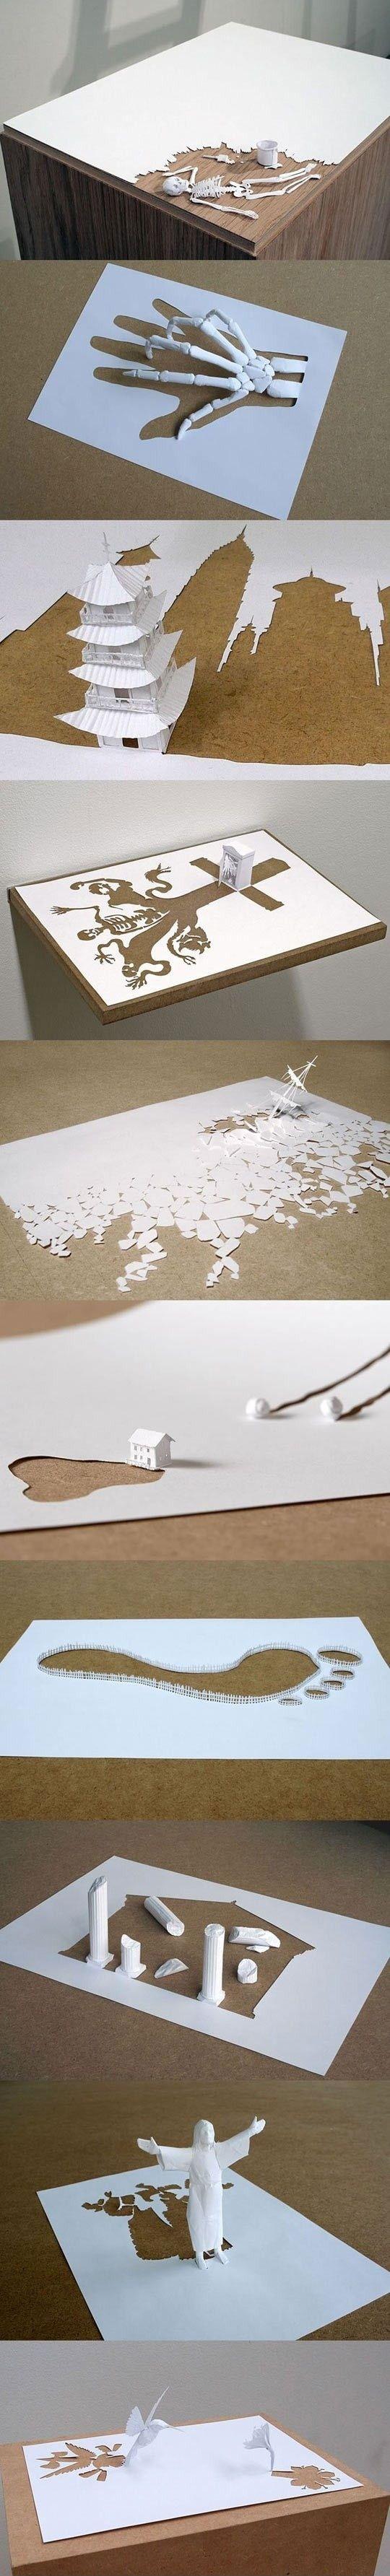 Nice Paper Art